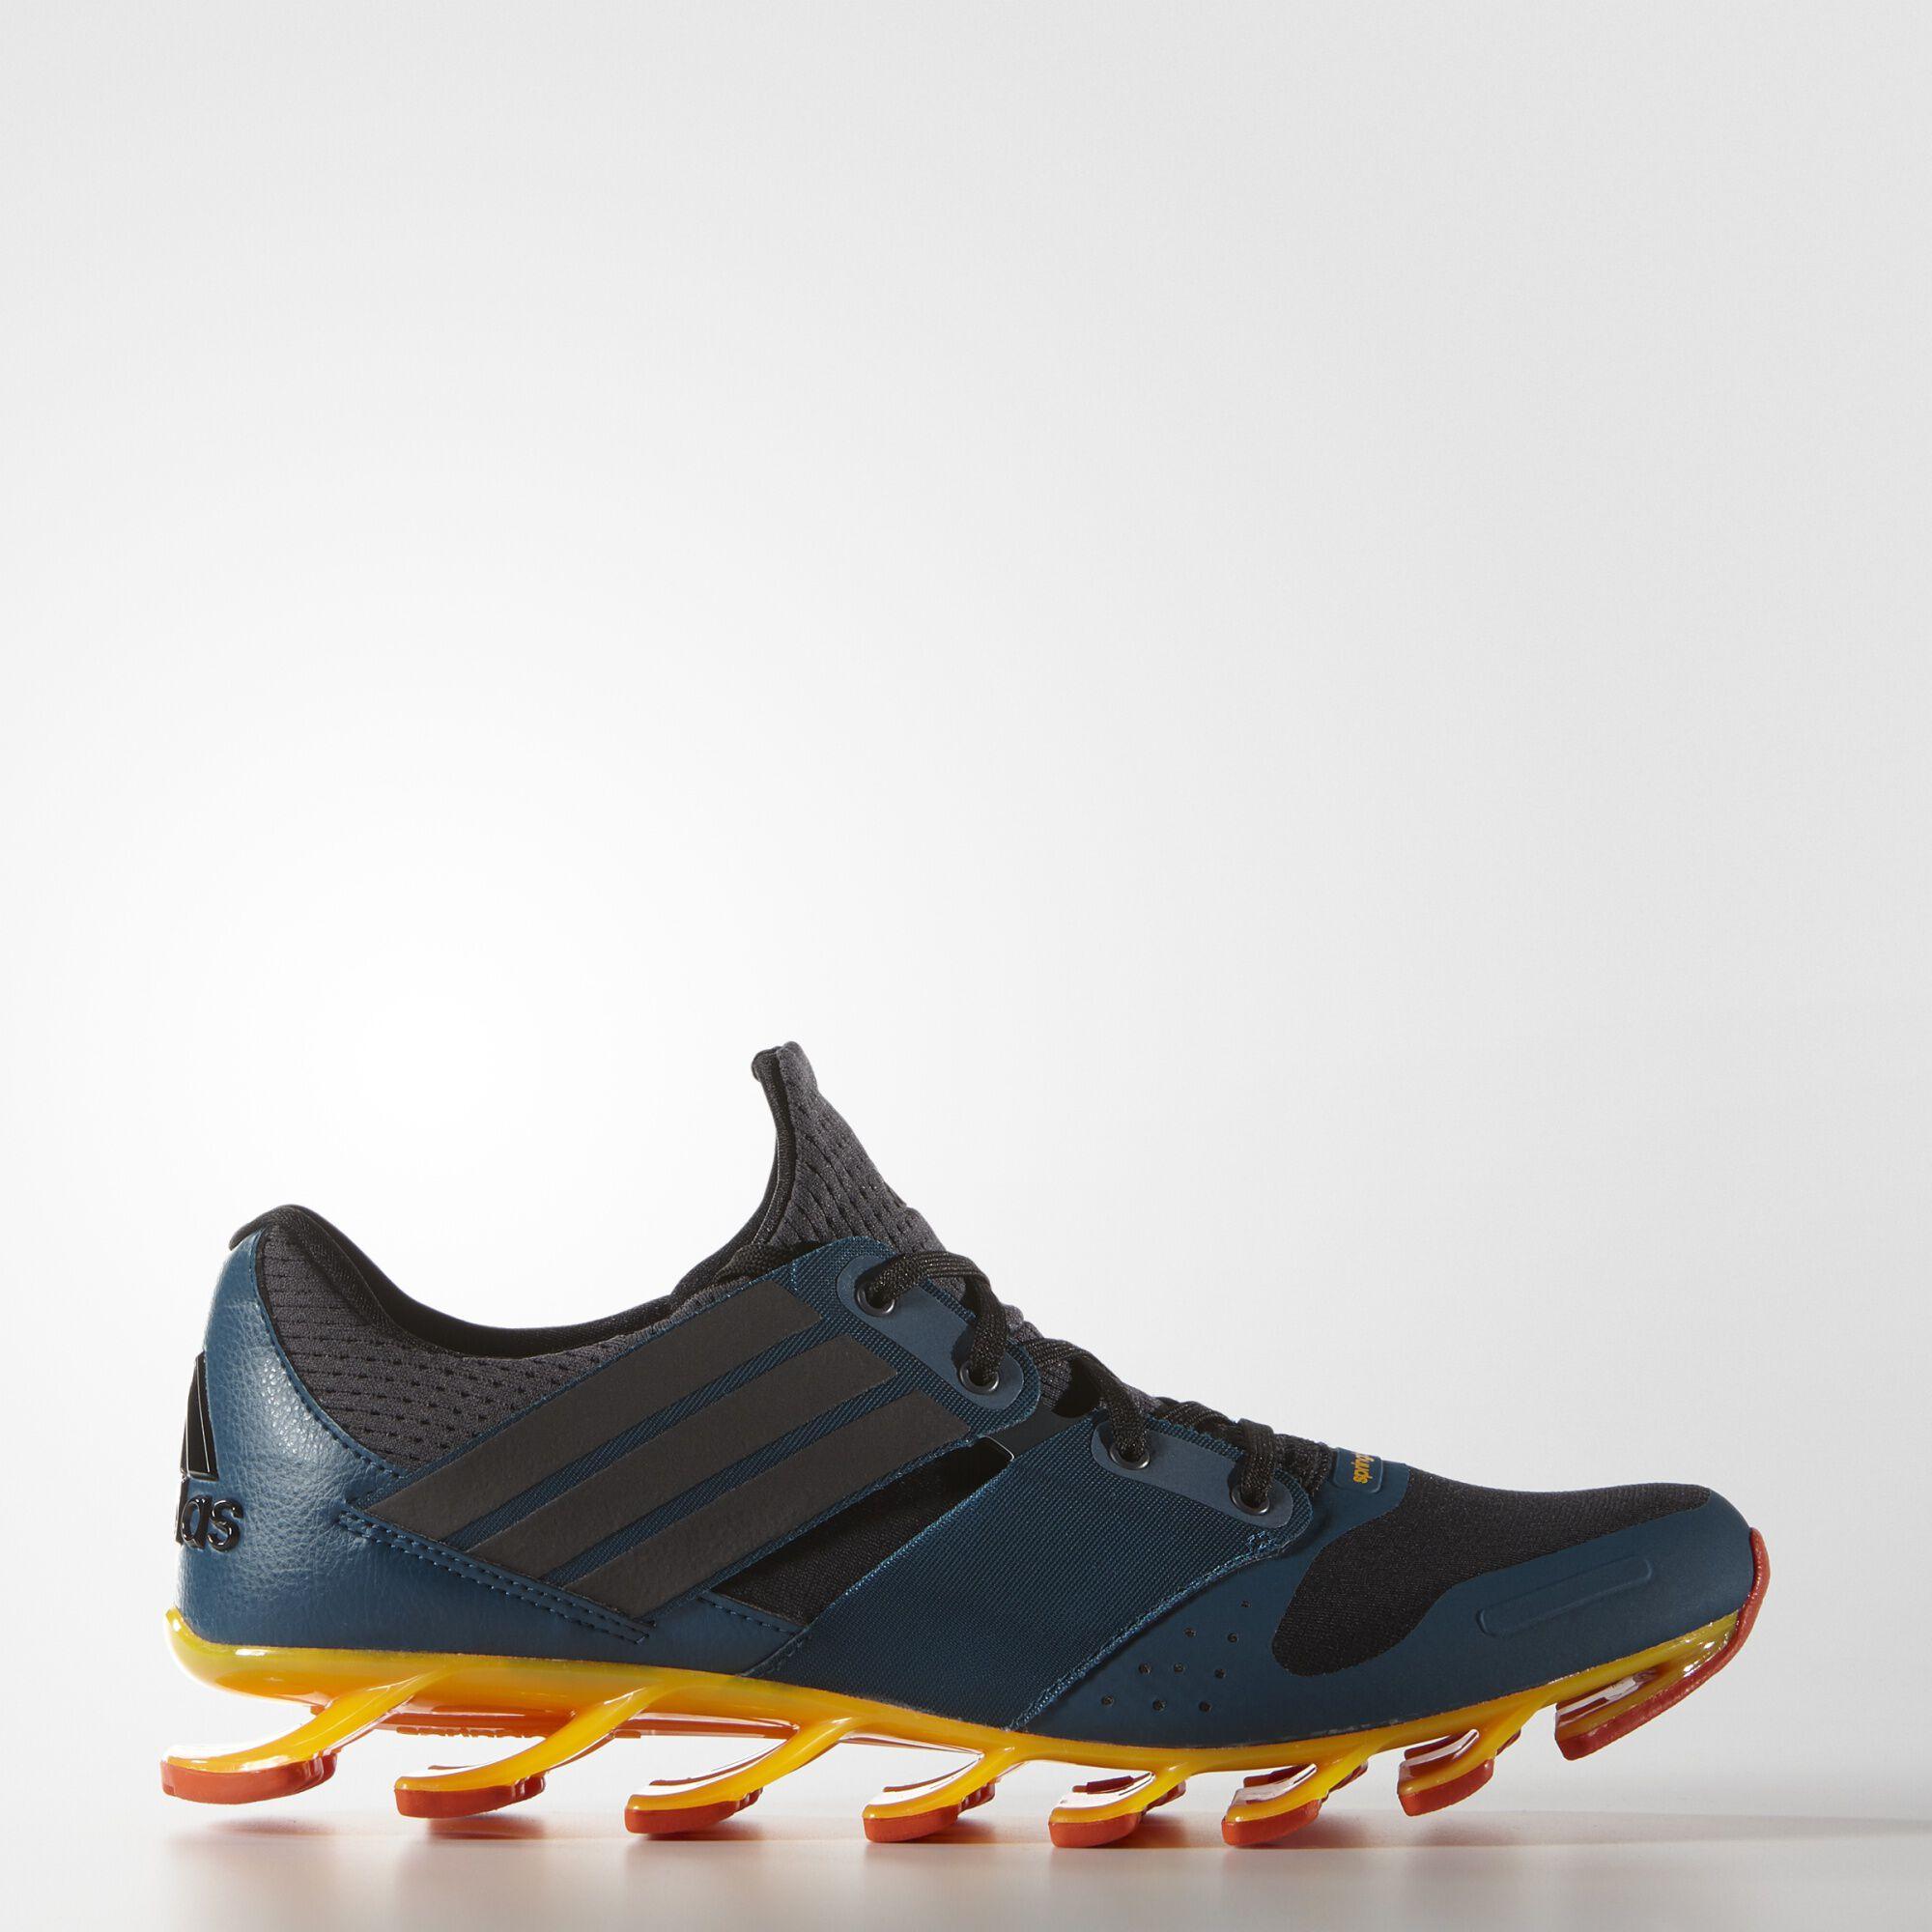 b693613d589d8 store adidas springblade kids c0beb 0dbfe